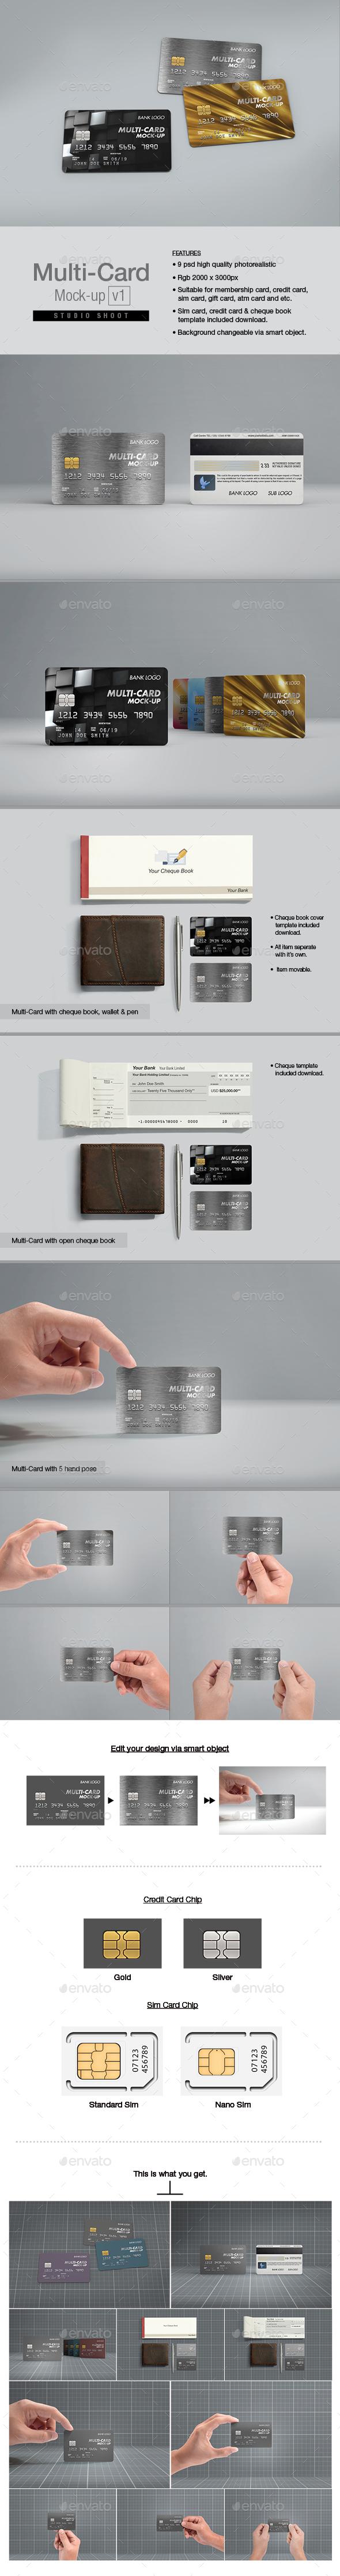 Multi-Card Mock-up v1